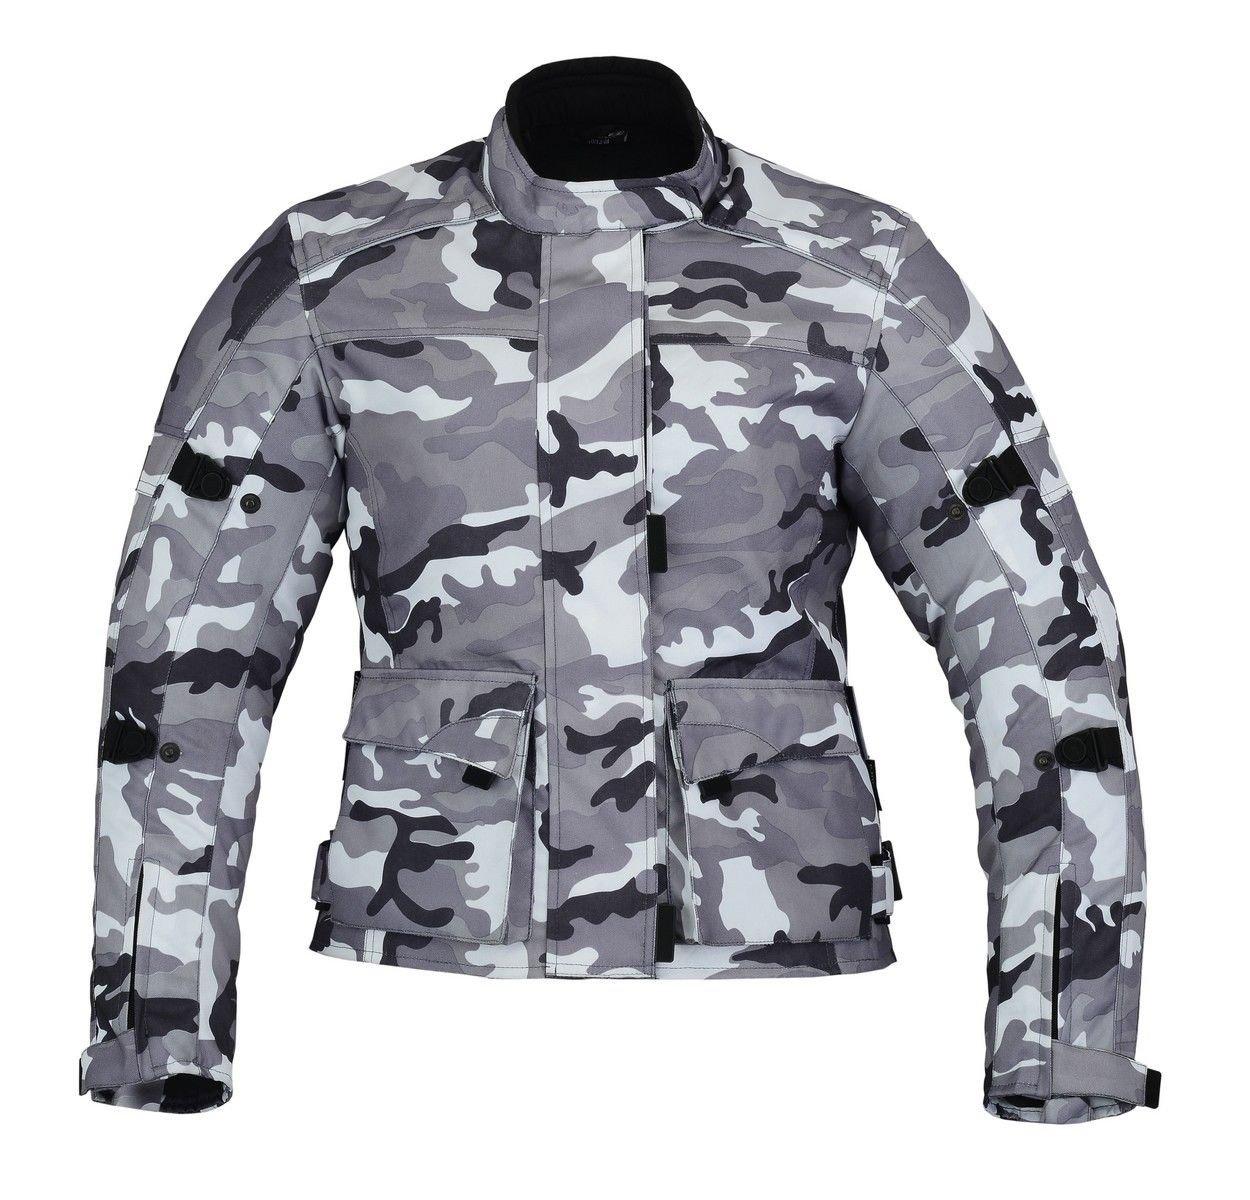 impermeable de camuflaje con protecciones CE camouflage 14 // L KYB Chaqueta para motocicleta